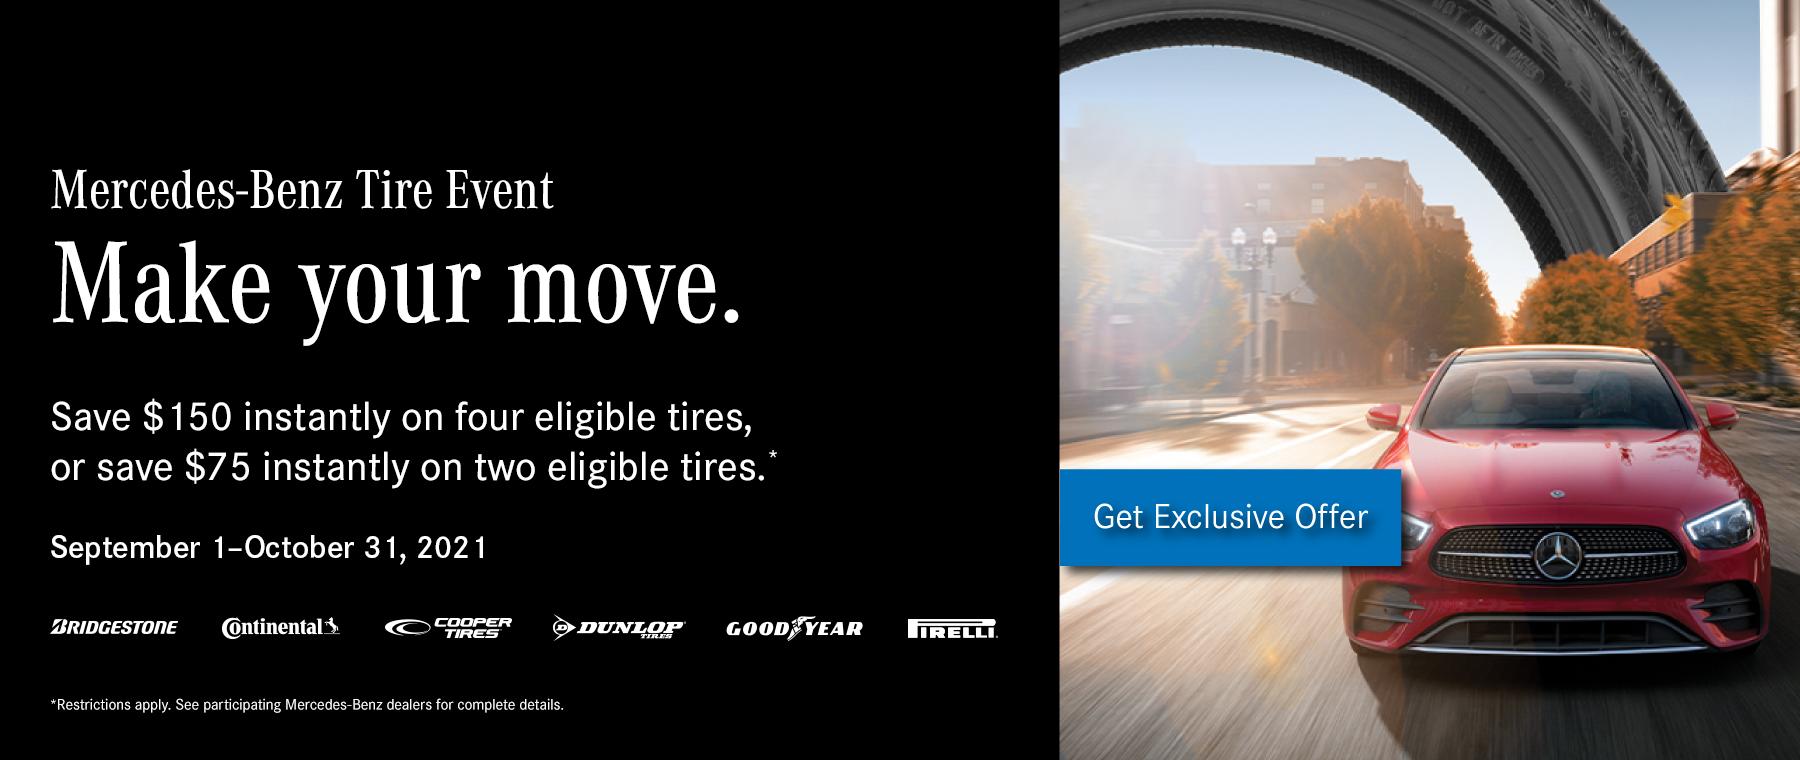 Mercedes-Benz of Greenwich mercedes tire specials